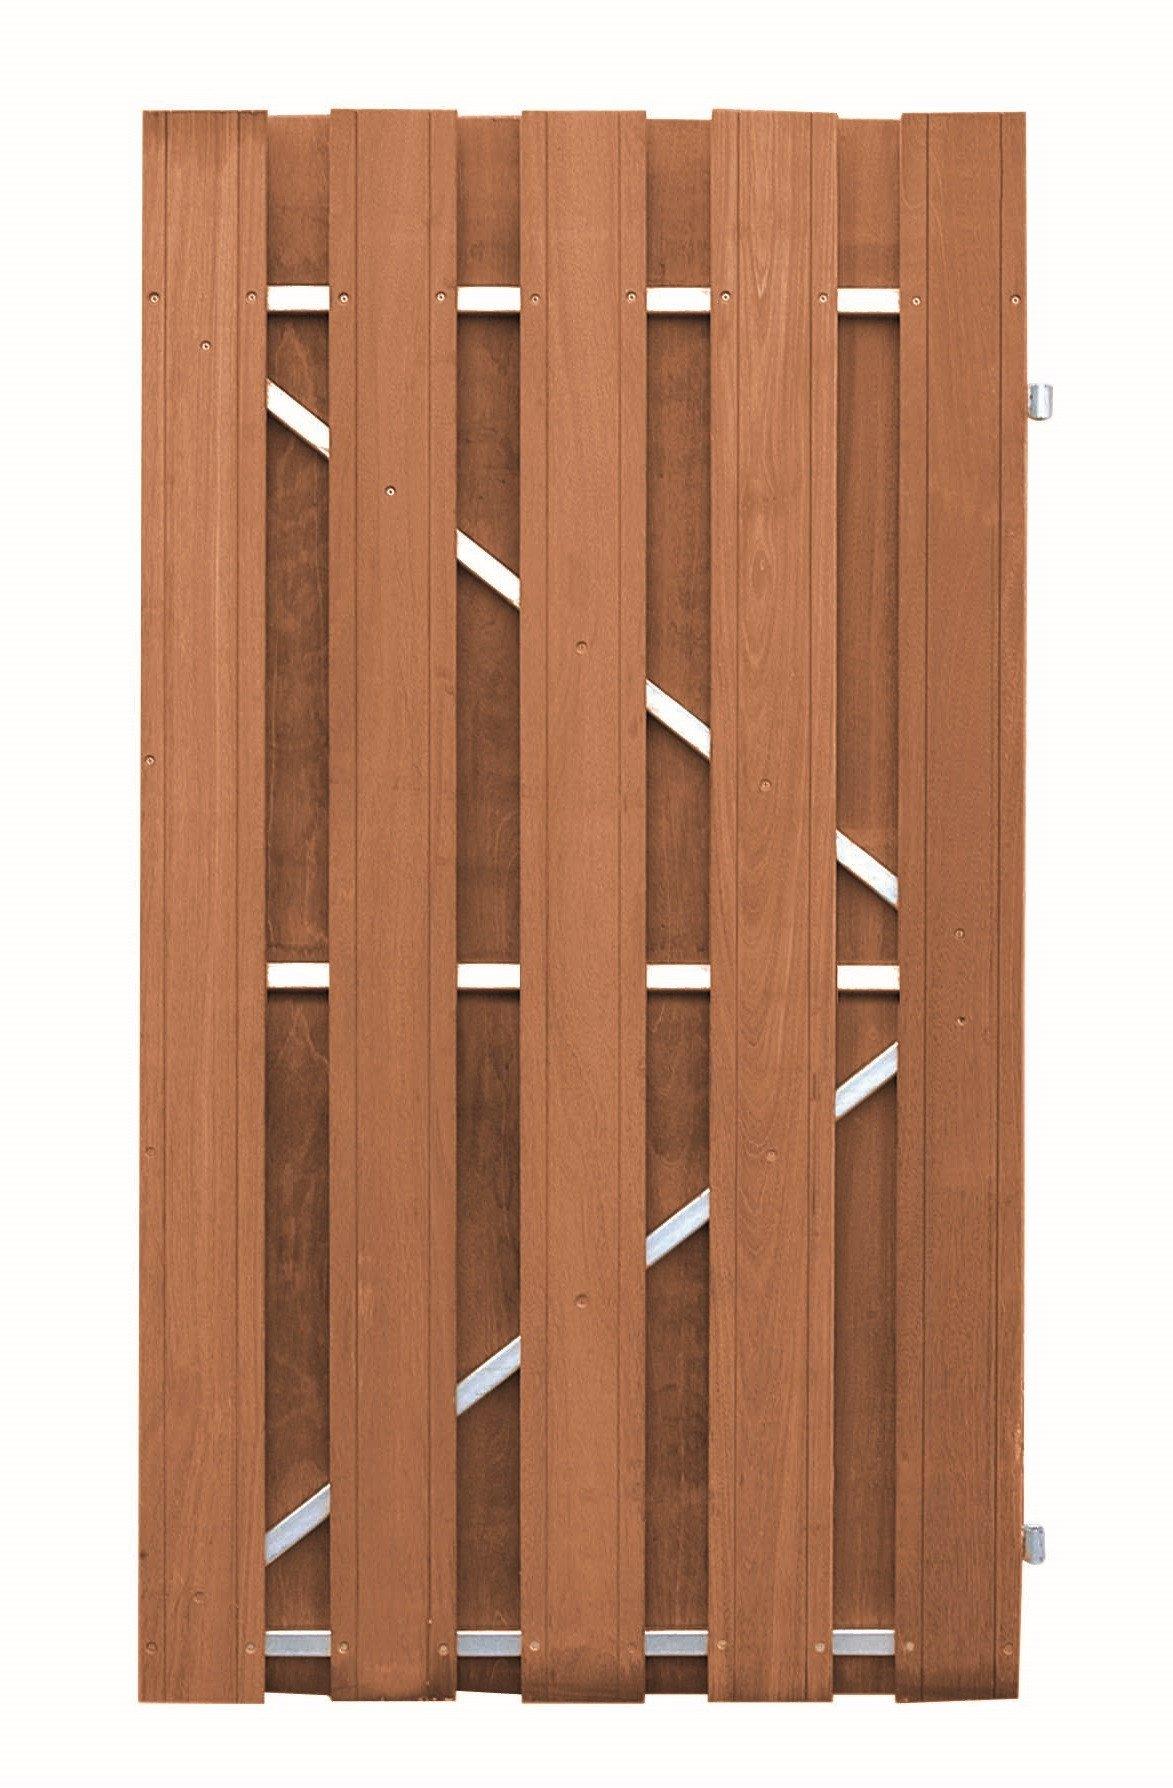 hardhouten tuindeur bangkirai metalen frame